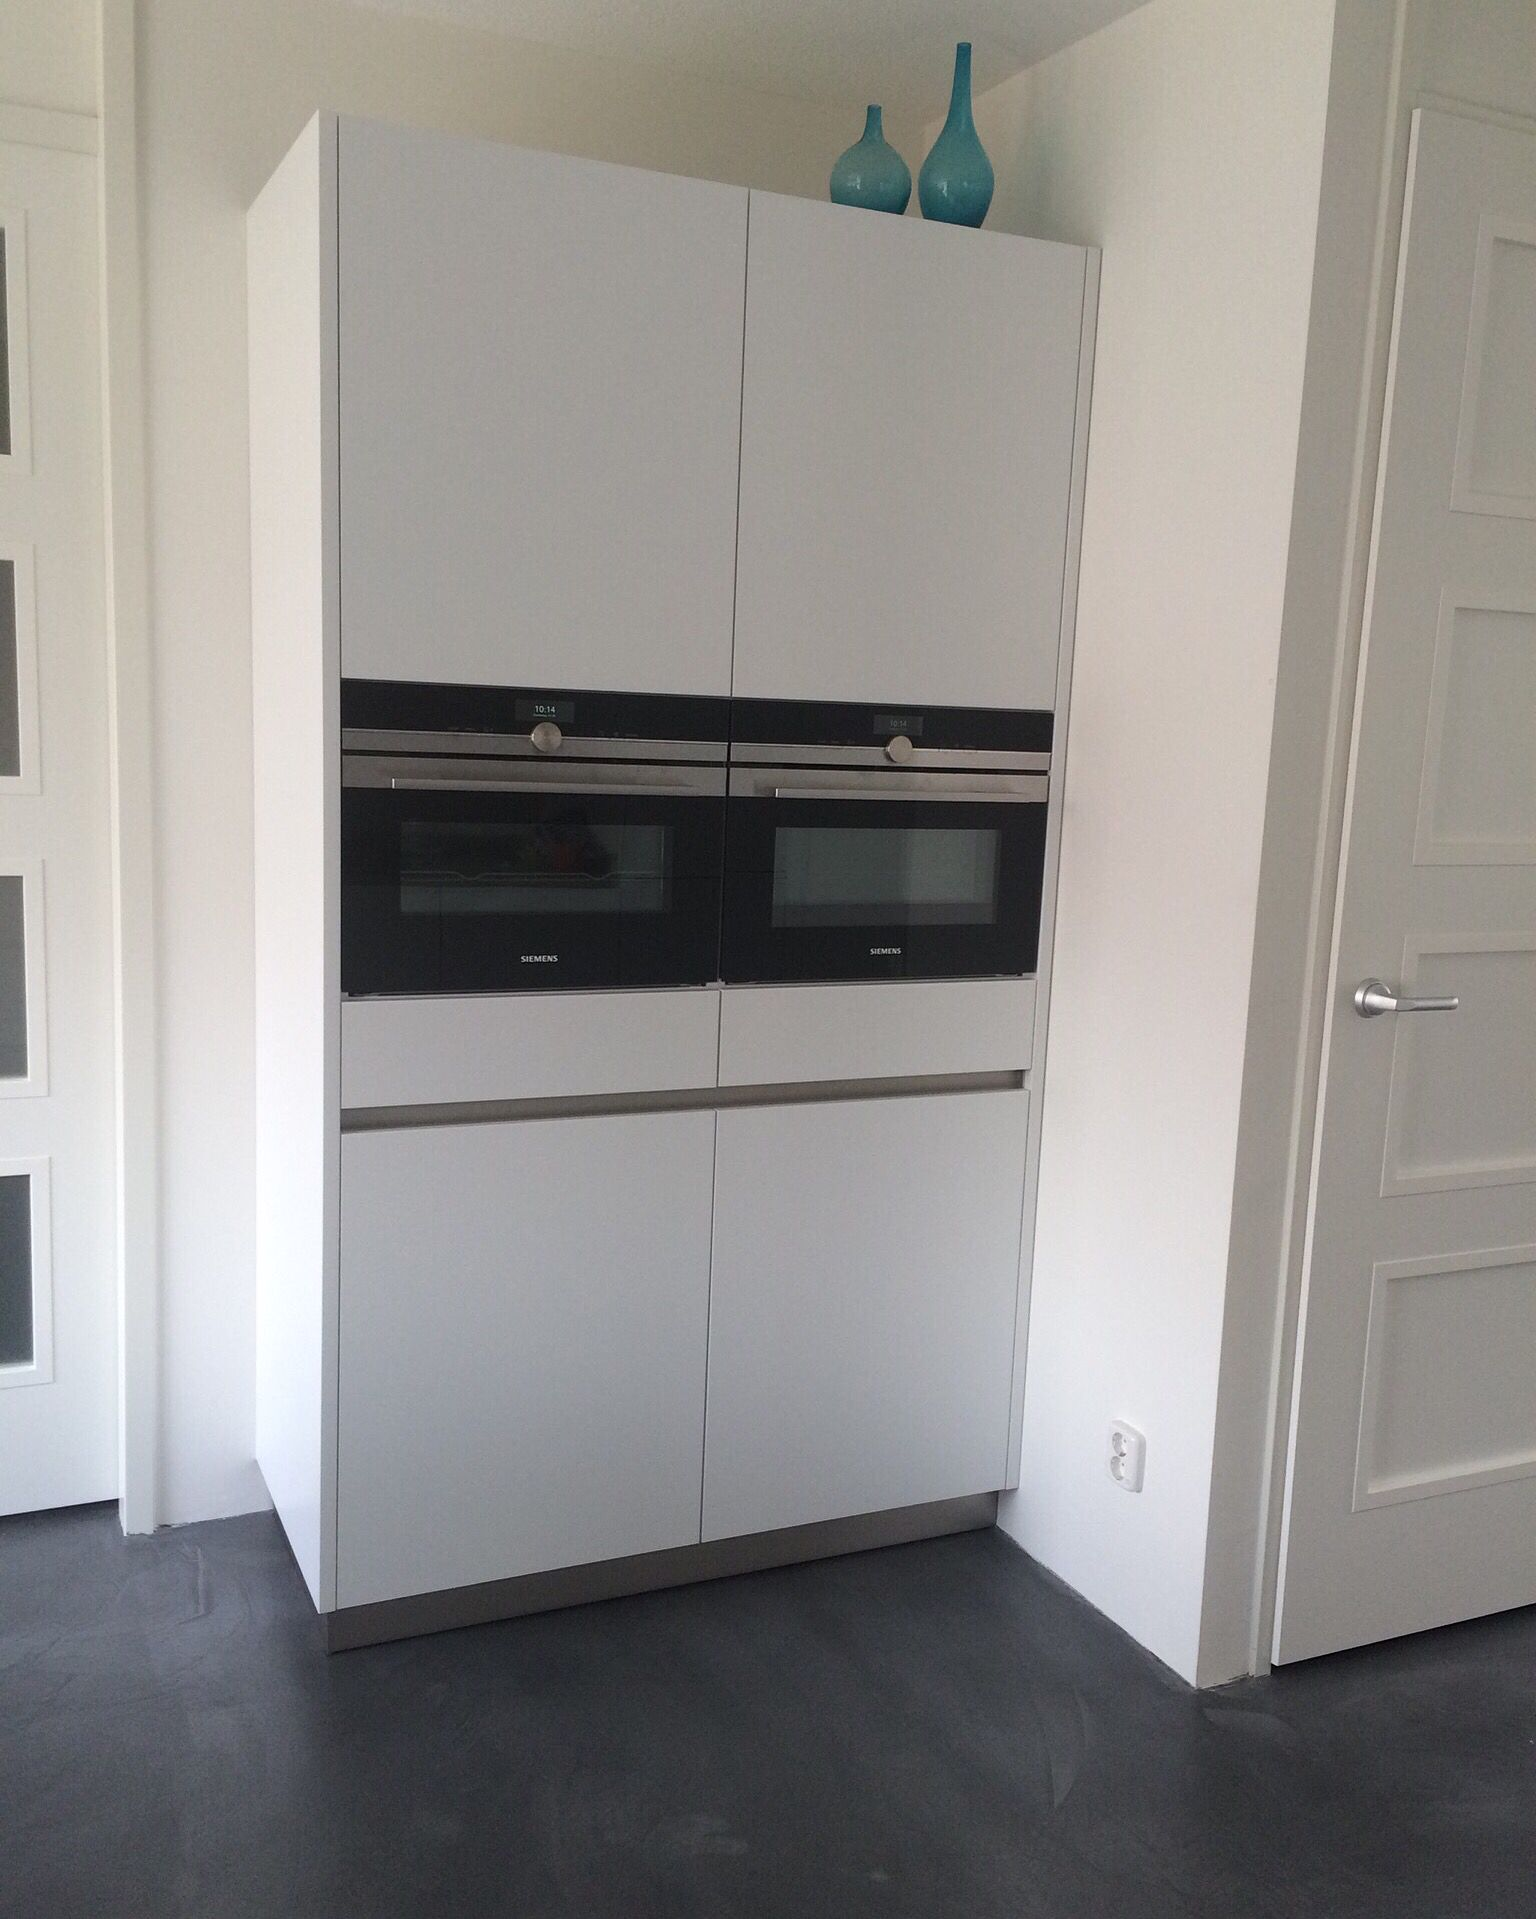 moderne keuken witte keuken stoomoven zelfreinigende oven vloer is